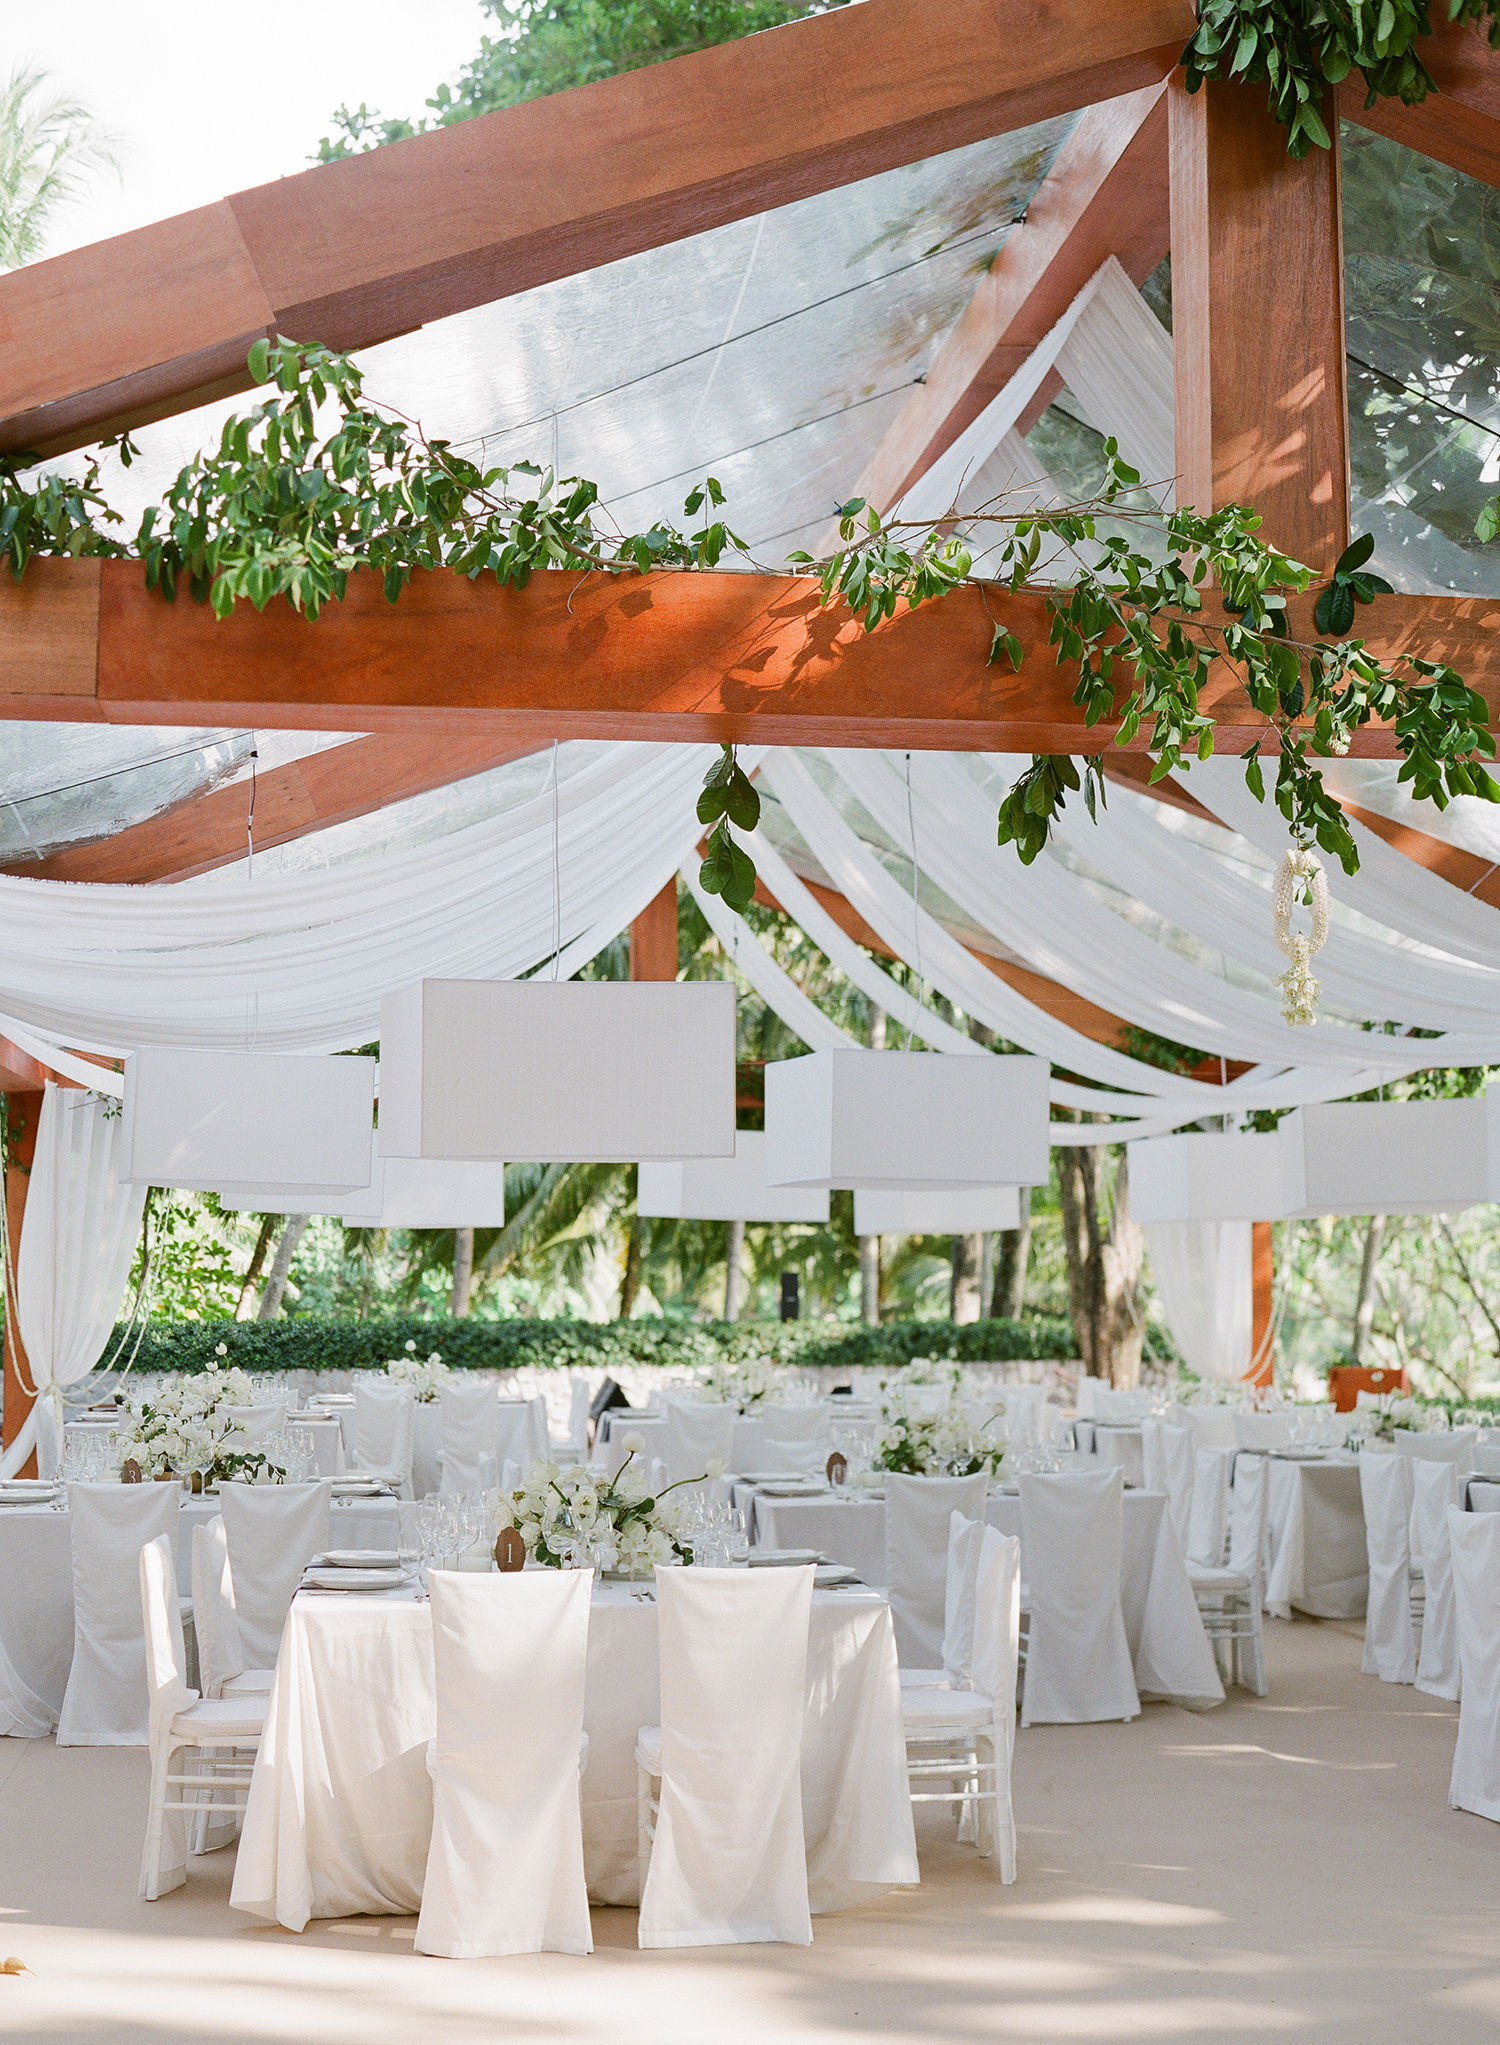 stacy brad wedding thailand reception white tables